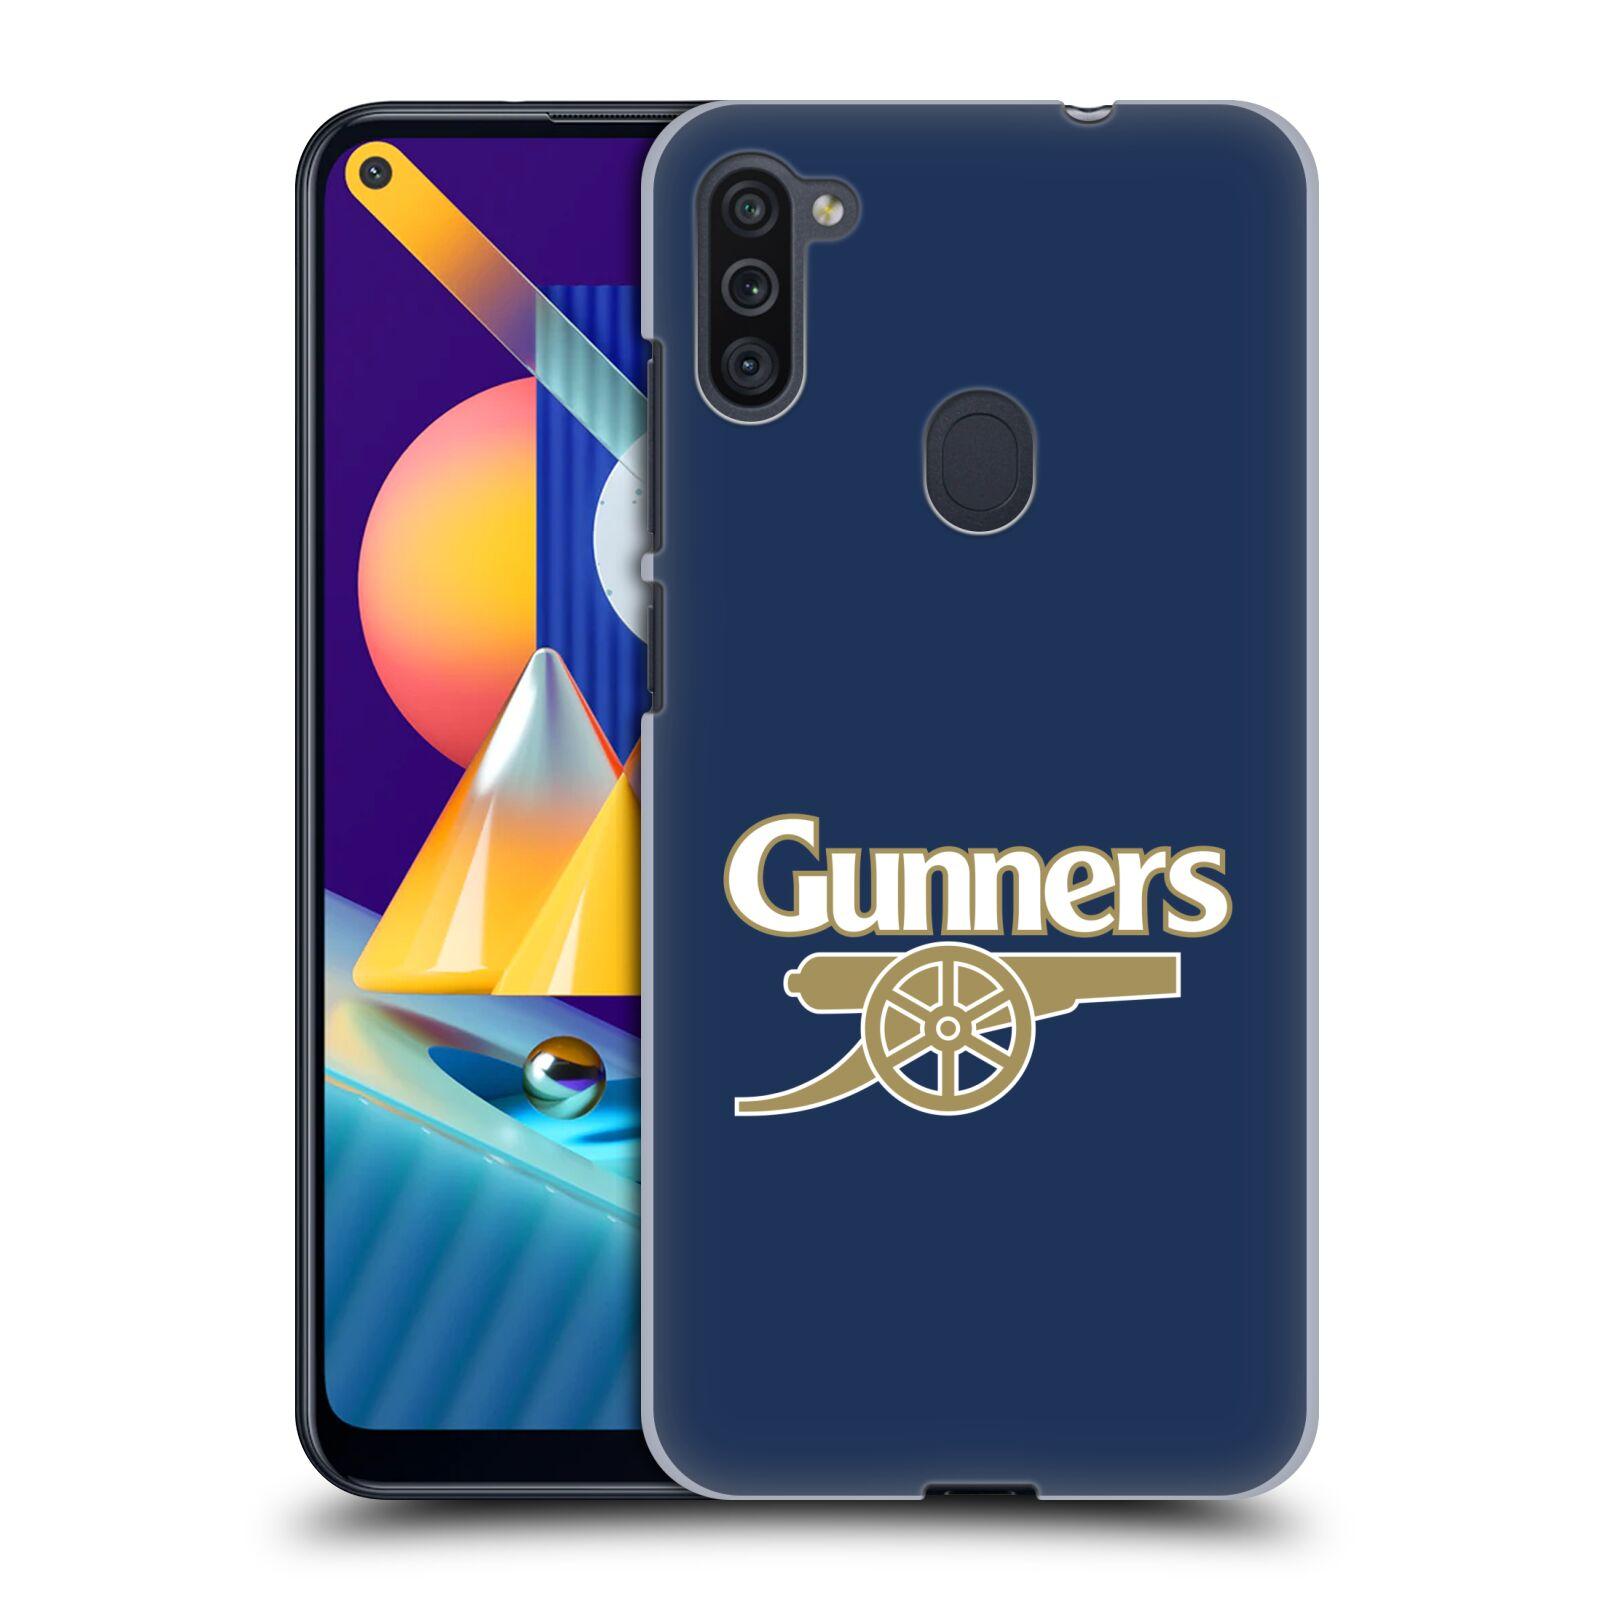 Plastové pouzdro na mobil Samsung Galaxy M11 - Head Case - Arsenal FC - Gunners